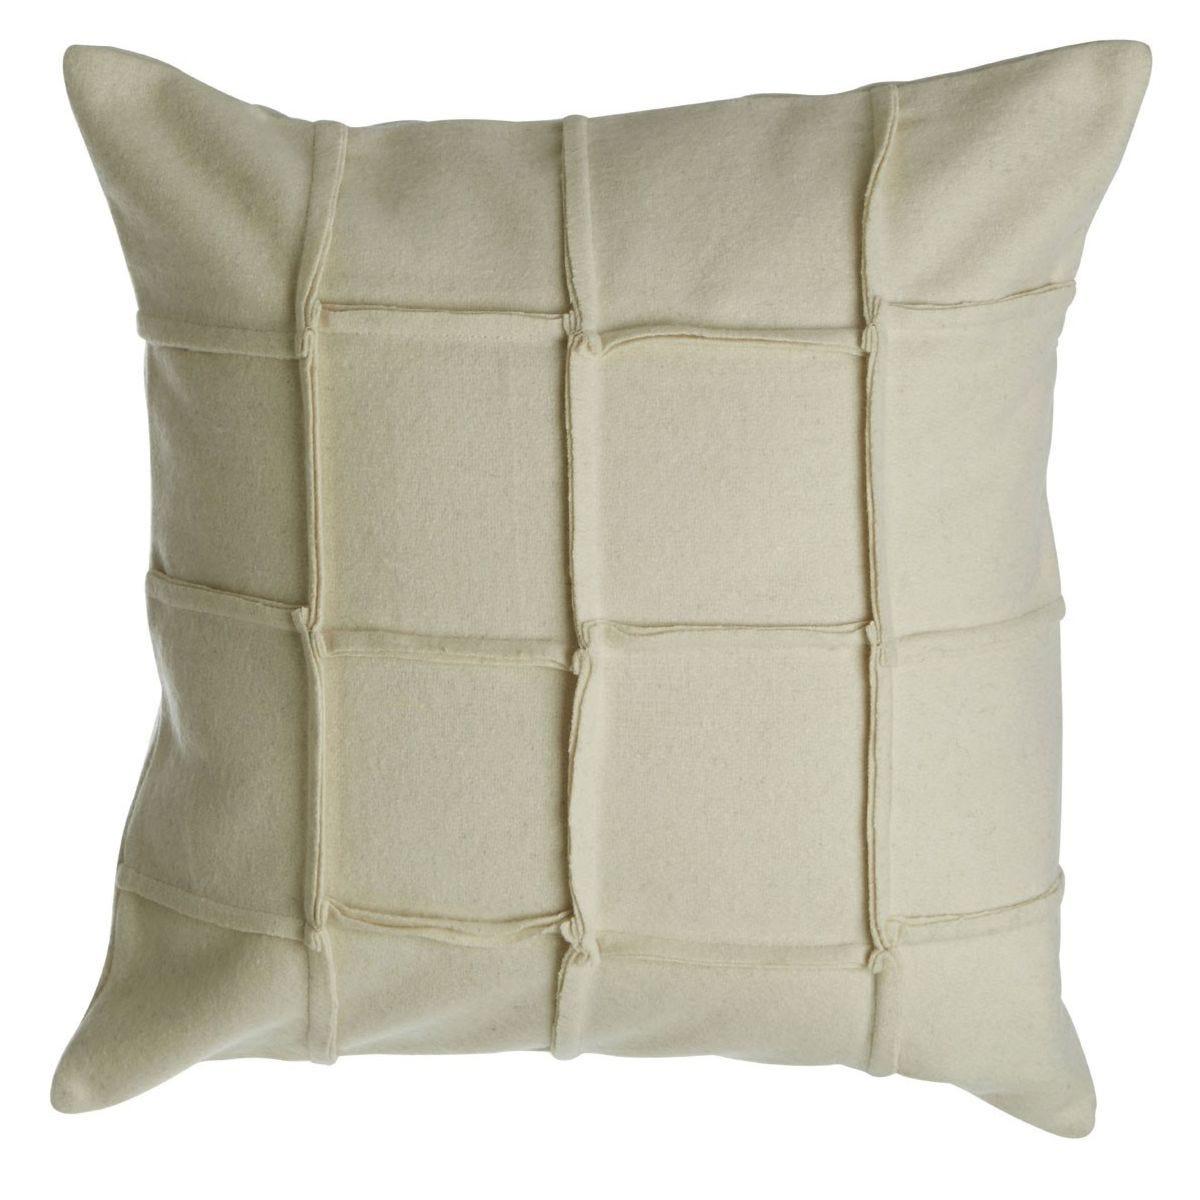 Premier Housewares Hampstead Felt Square Cushion - Cream